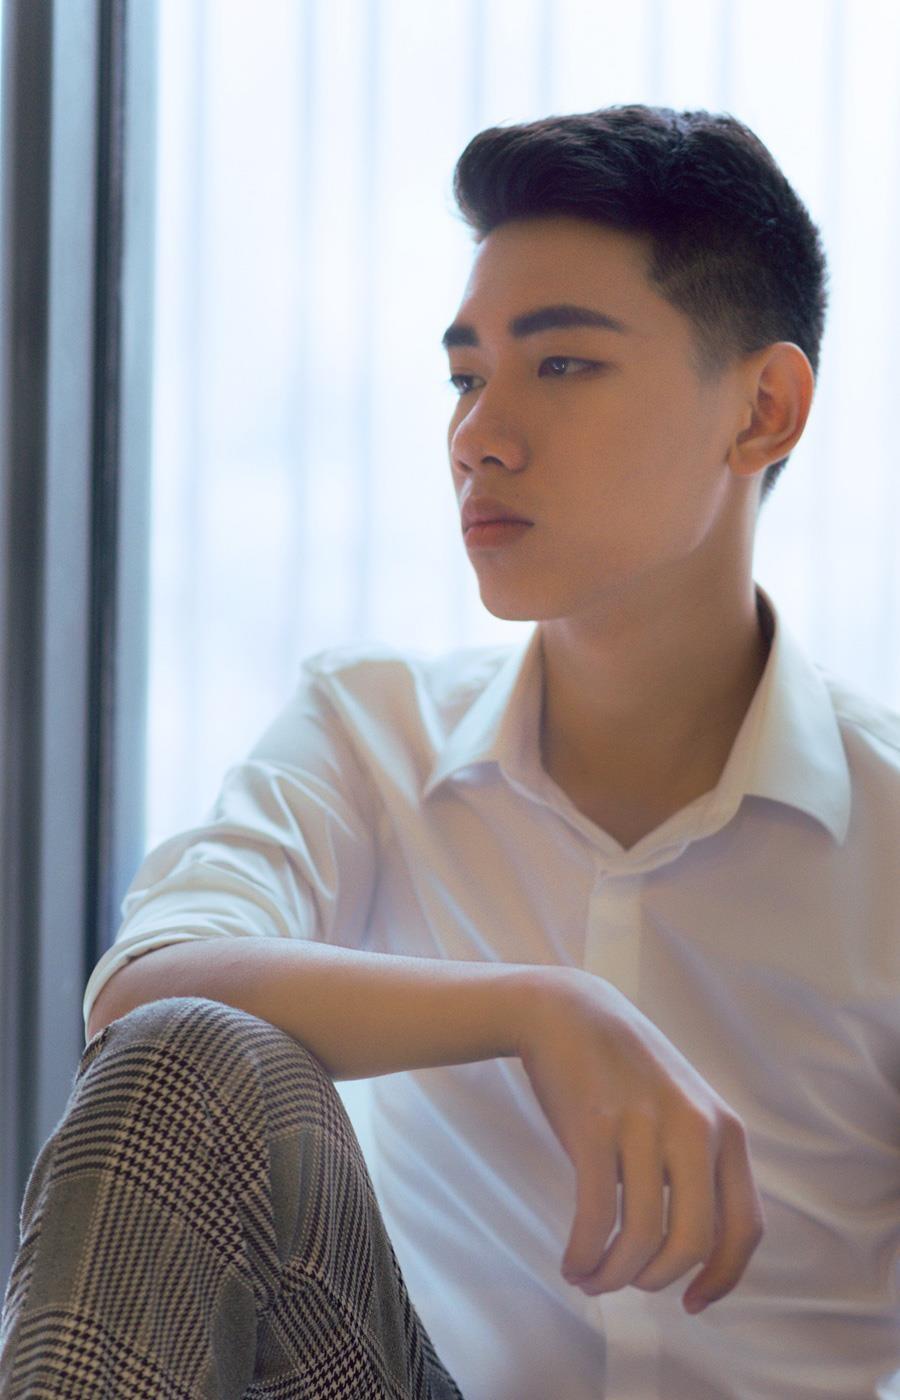 Producer 'Bac phan': 'Muon tao san pham chan dong nhu Despacito' hinh anh 5